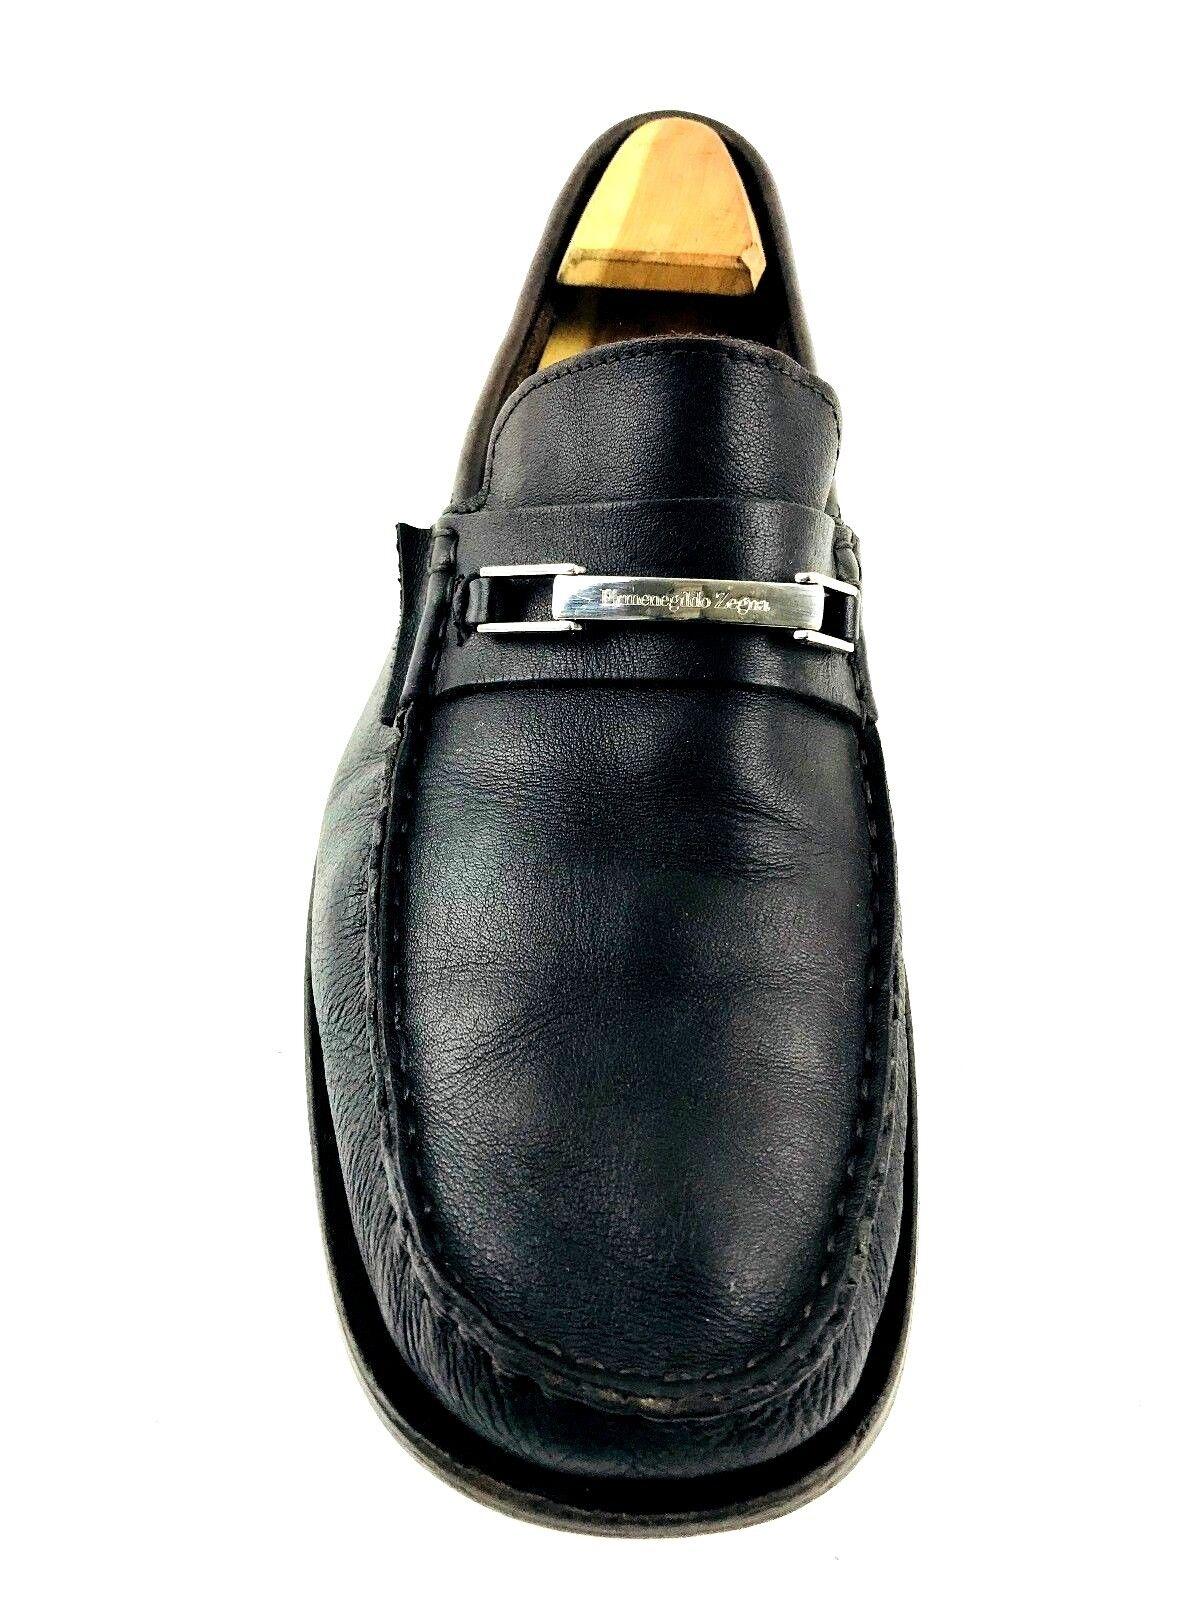 ERMENEGILDO ZEGNA braun Leather Mens Mens Mens Loafer US.11 UK.10.5 EU.44 67cf3f